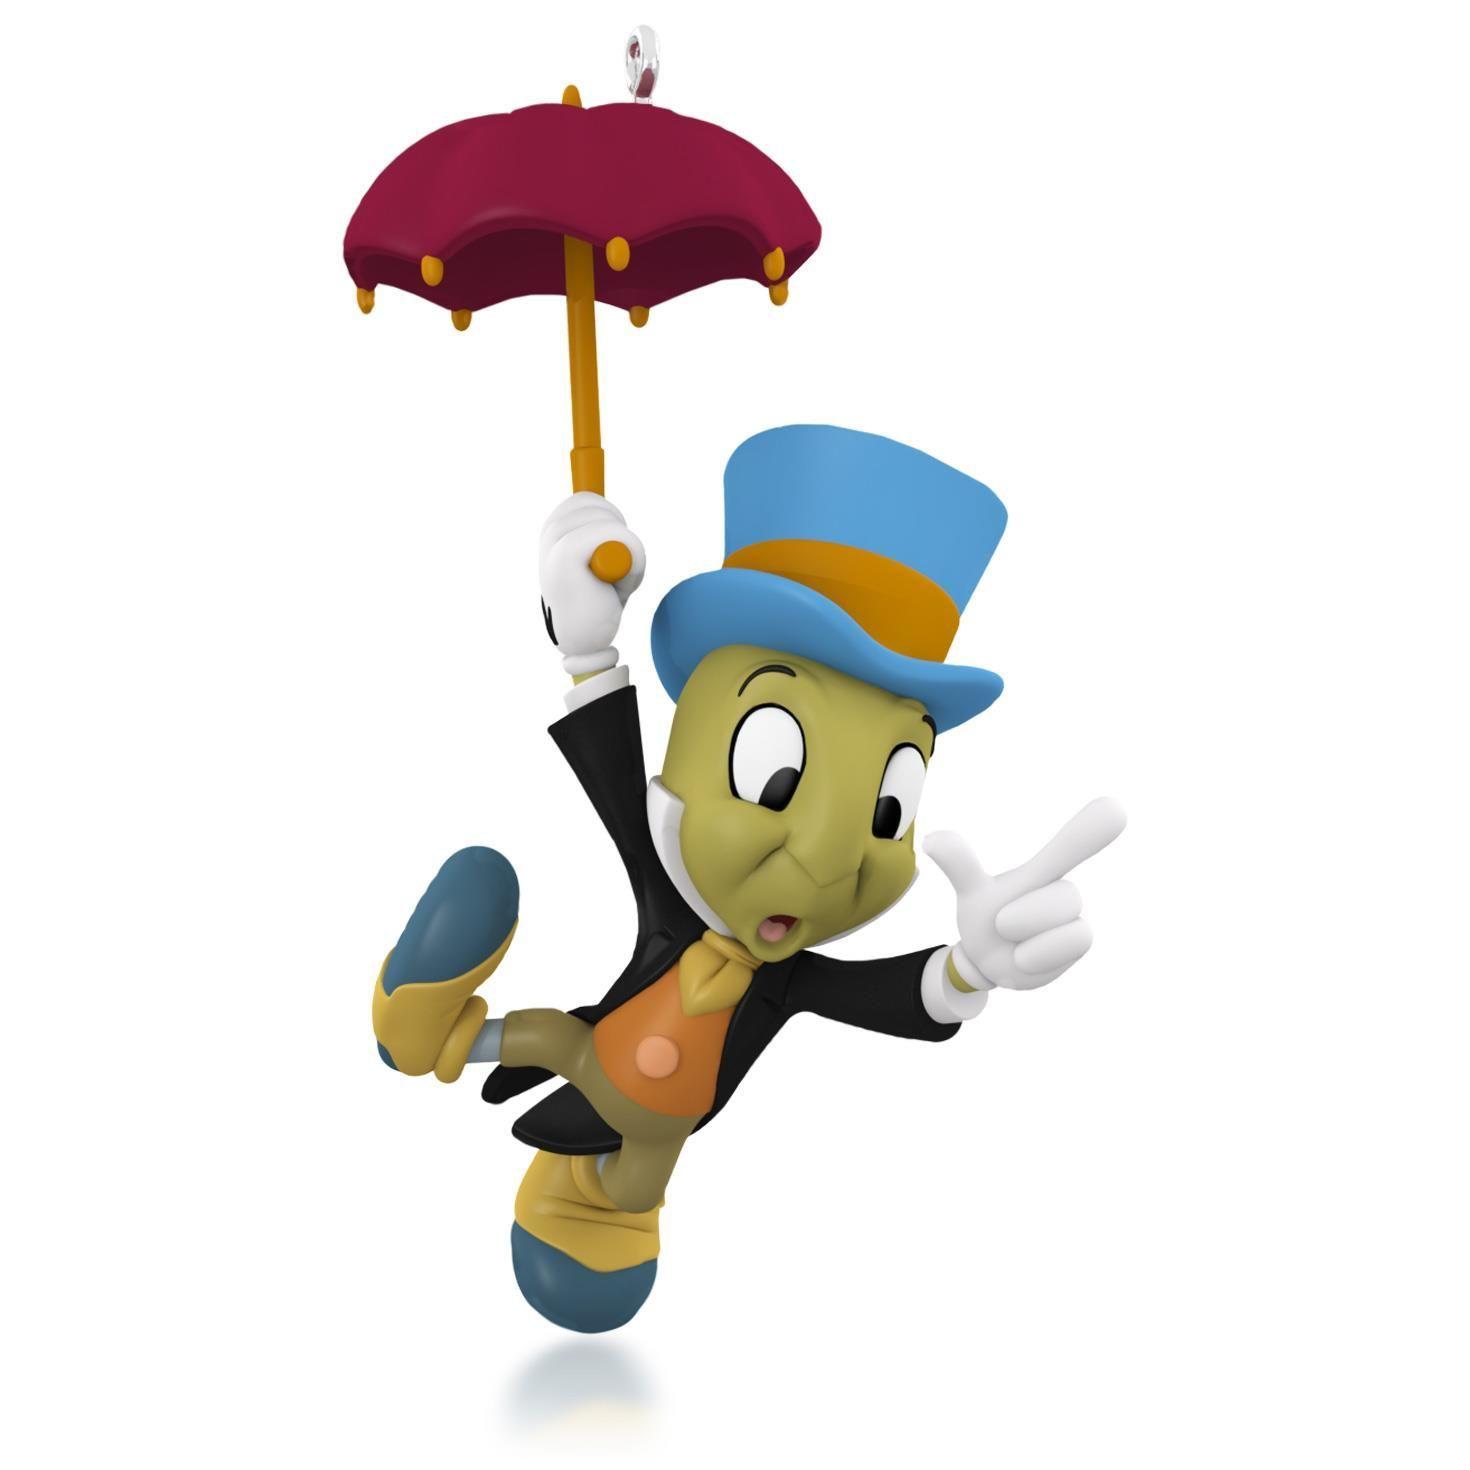 Disney Pinocchio Jiminy Cricket Ornament | Dear Santa... | Pinterest ...